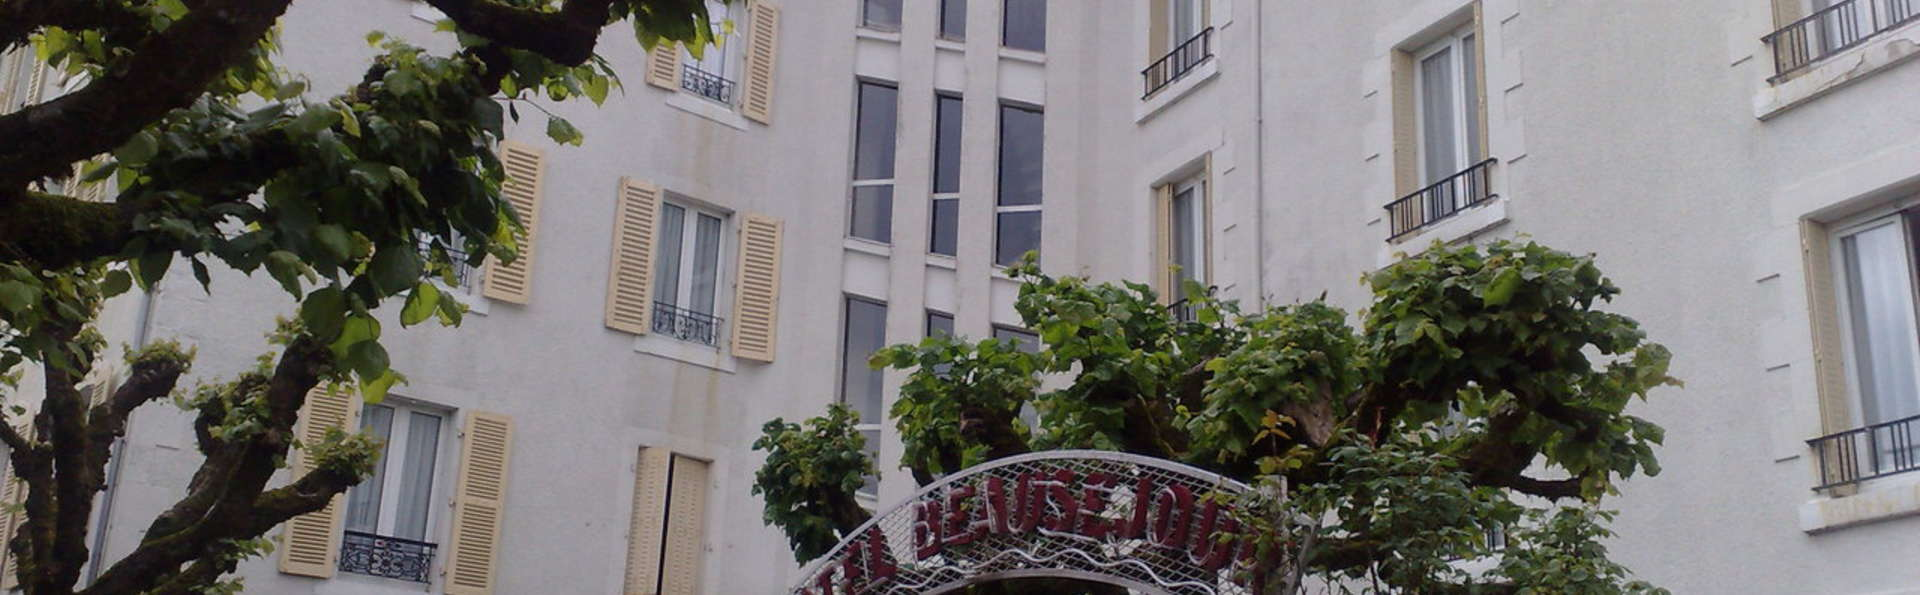 Hôtel Beauséjour - EntreeBeausejour.jpg